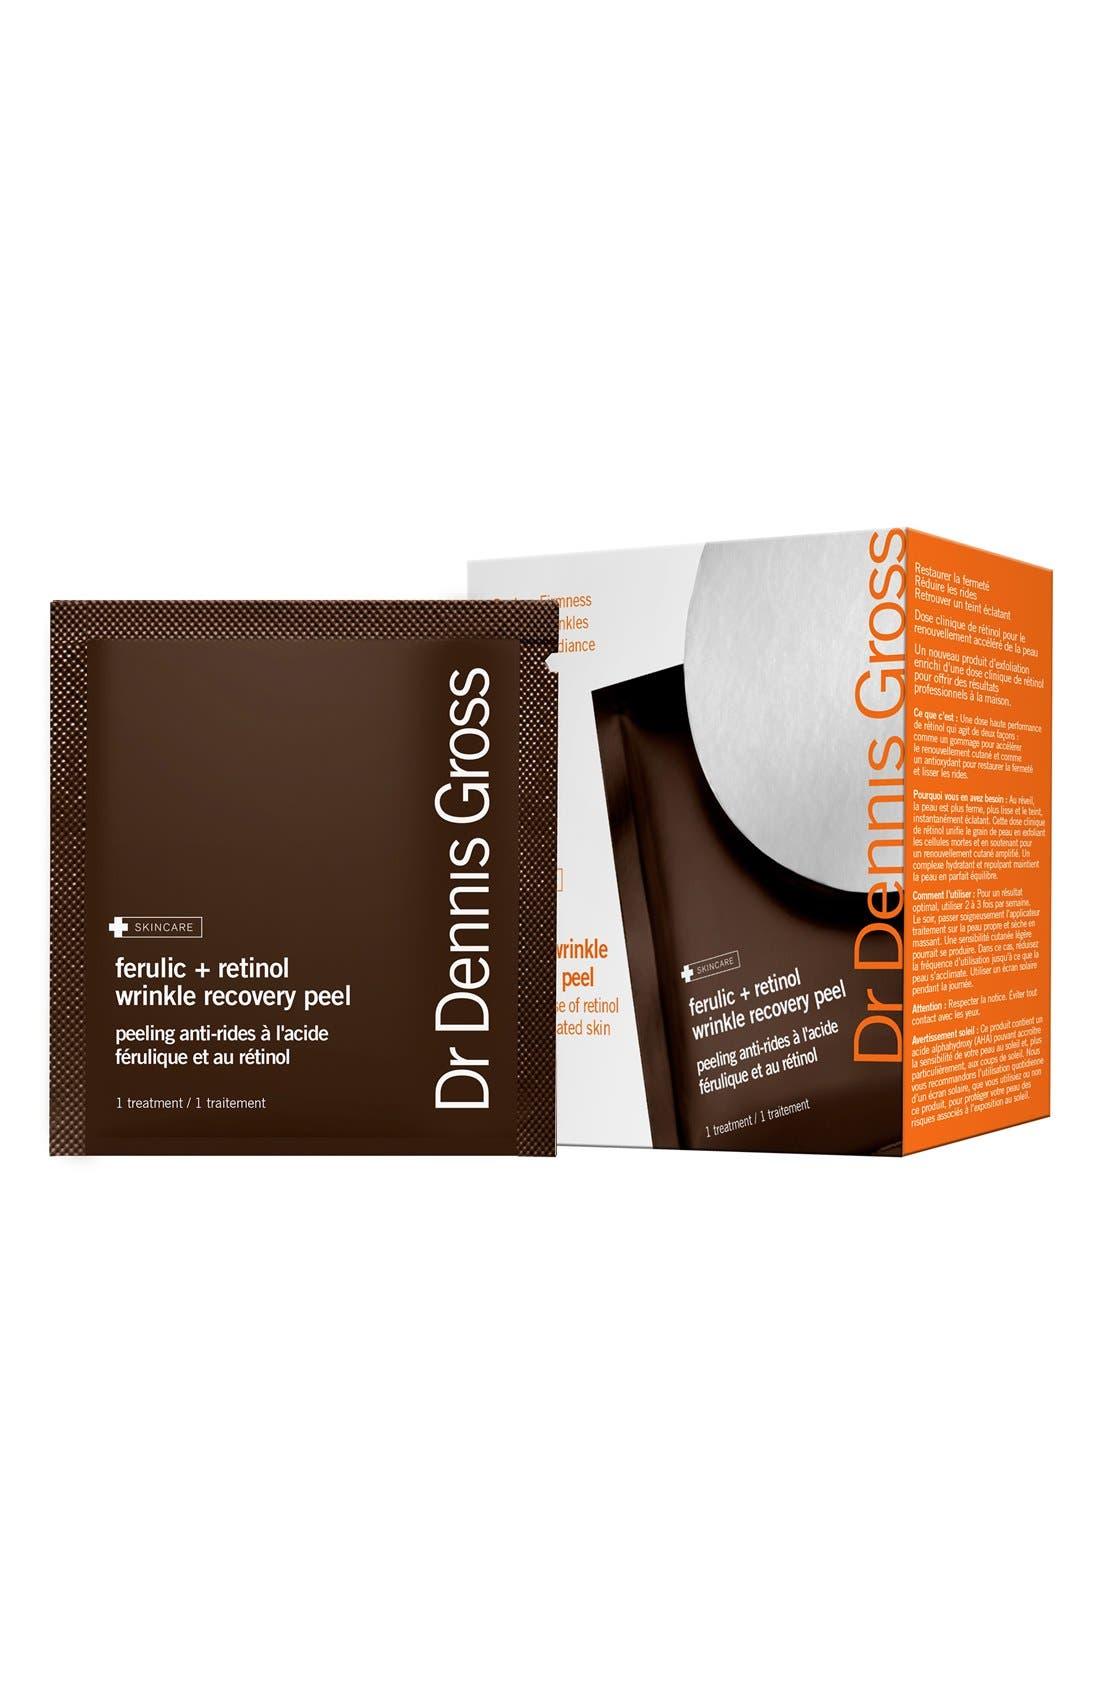 Dr. Dennis Gross Skincare 'Ferulic + Retinol' Wrinkle Recovery Peel